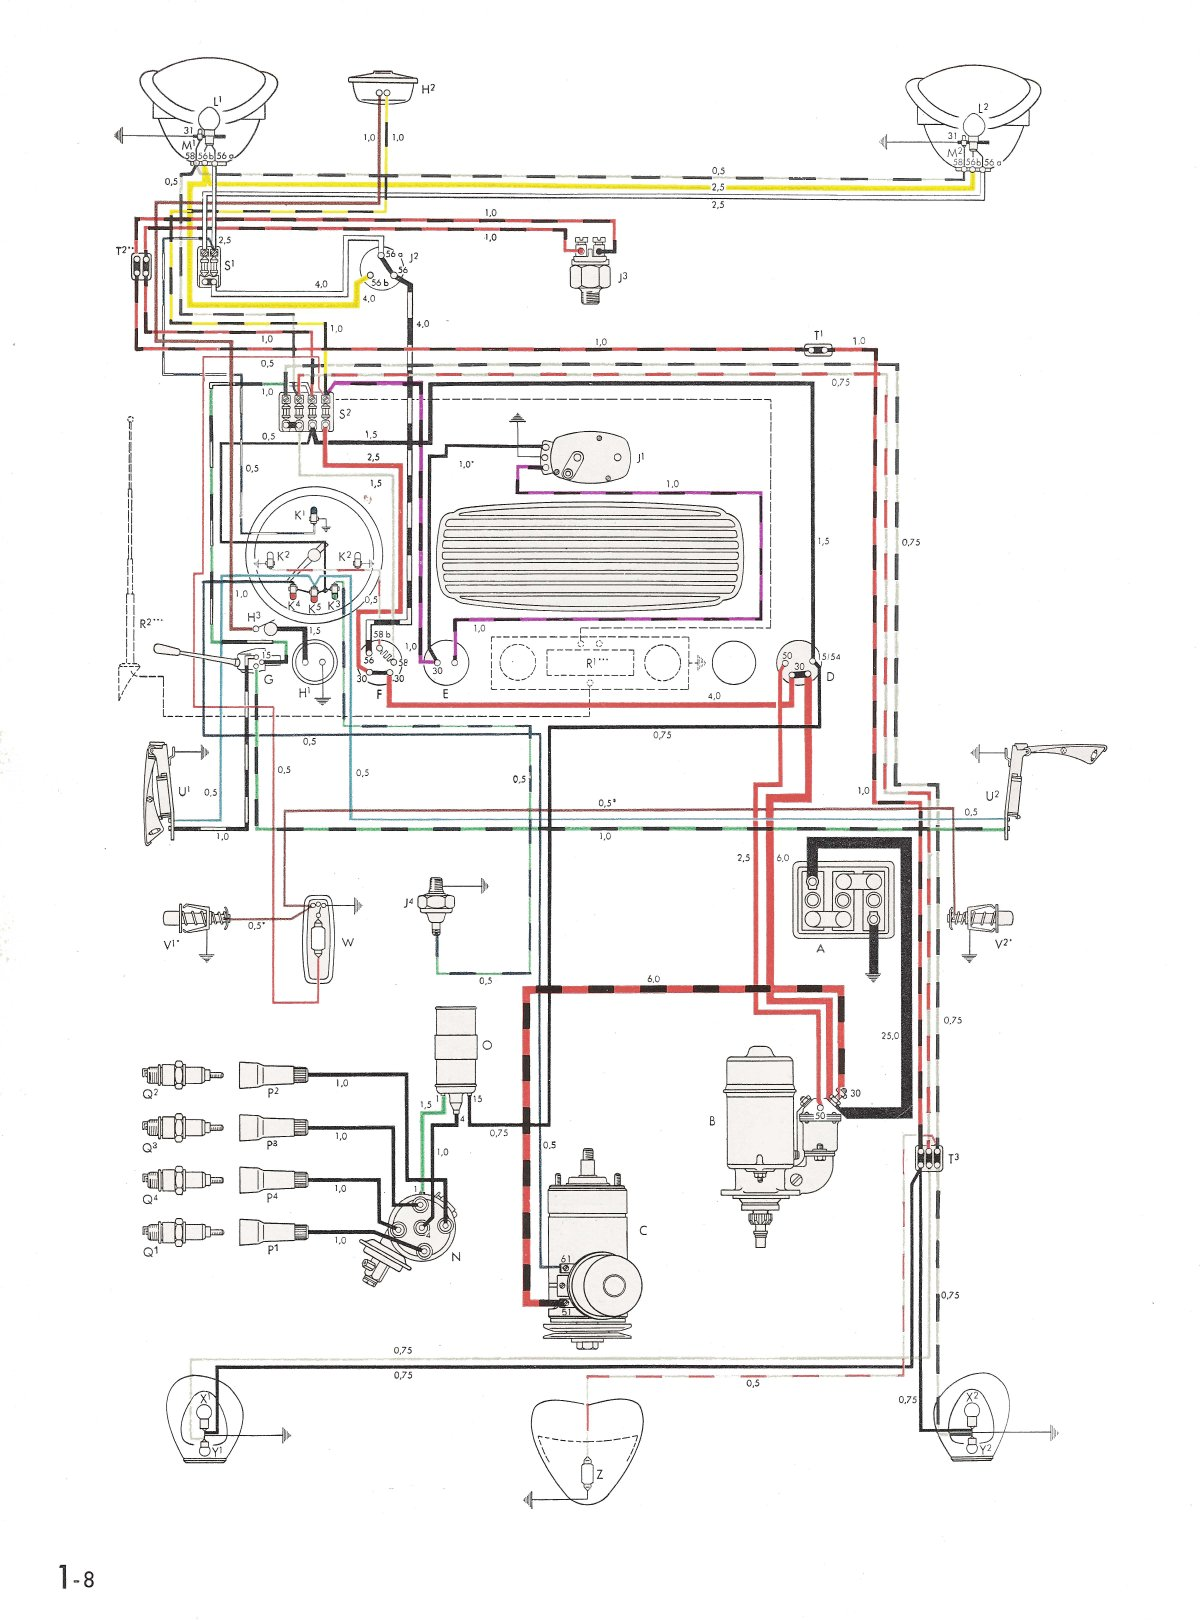 thesamba com type 1 wiring diagrams